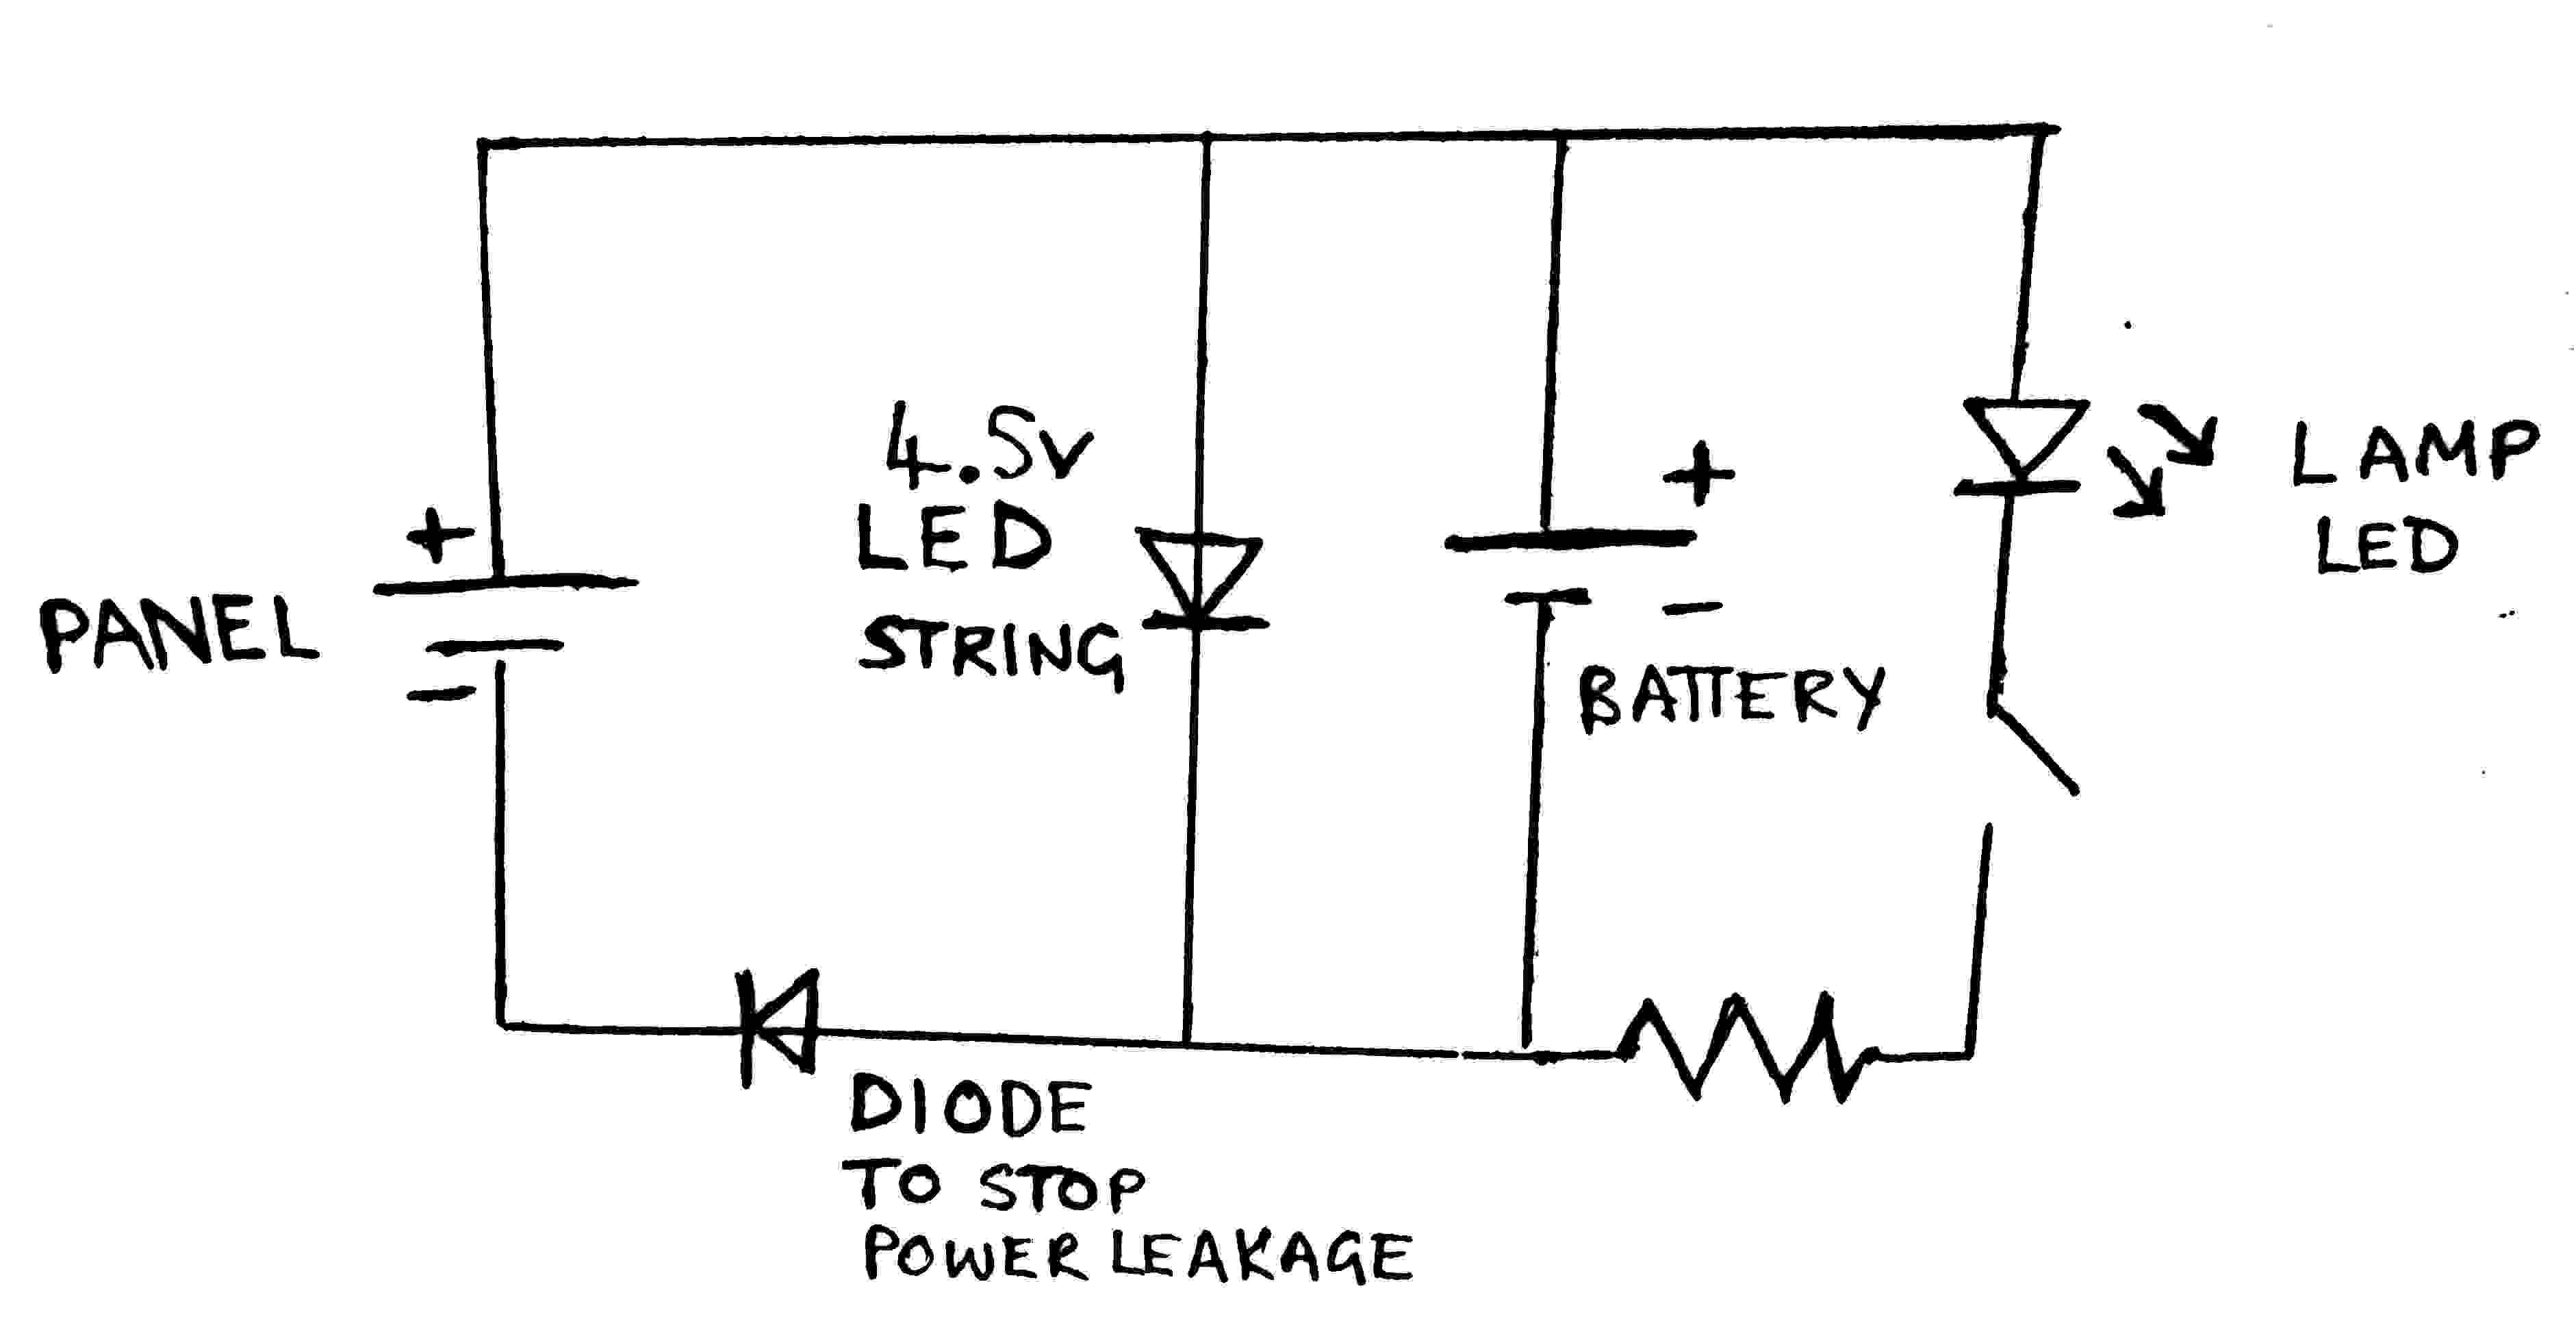 wiring 120v led garden lights wiring diagram database 120v dusk to dawn lights wiring 120v led garden lights [ 3763 x 1948 Pixel ]